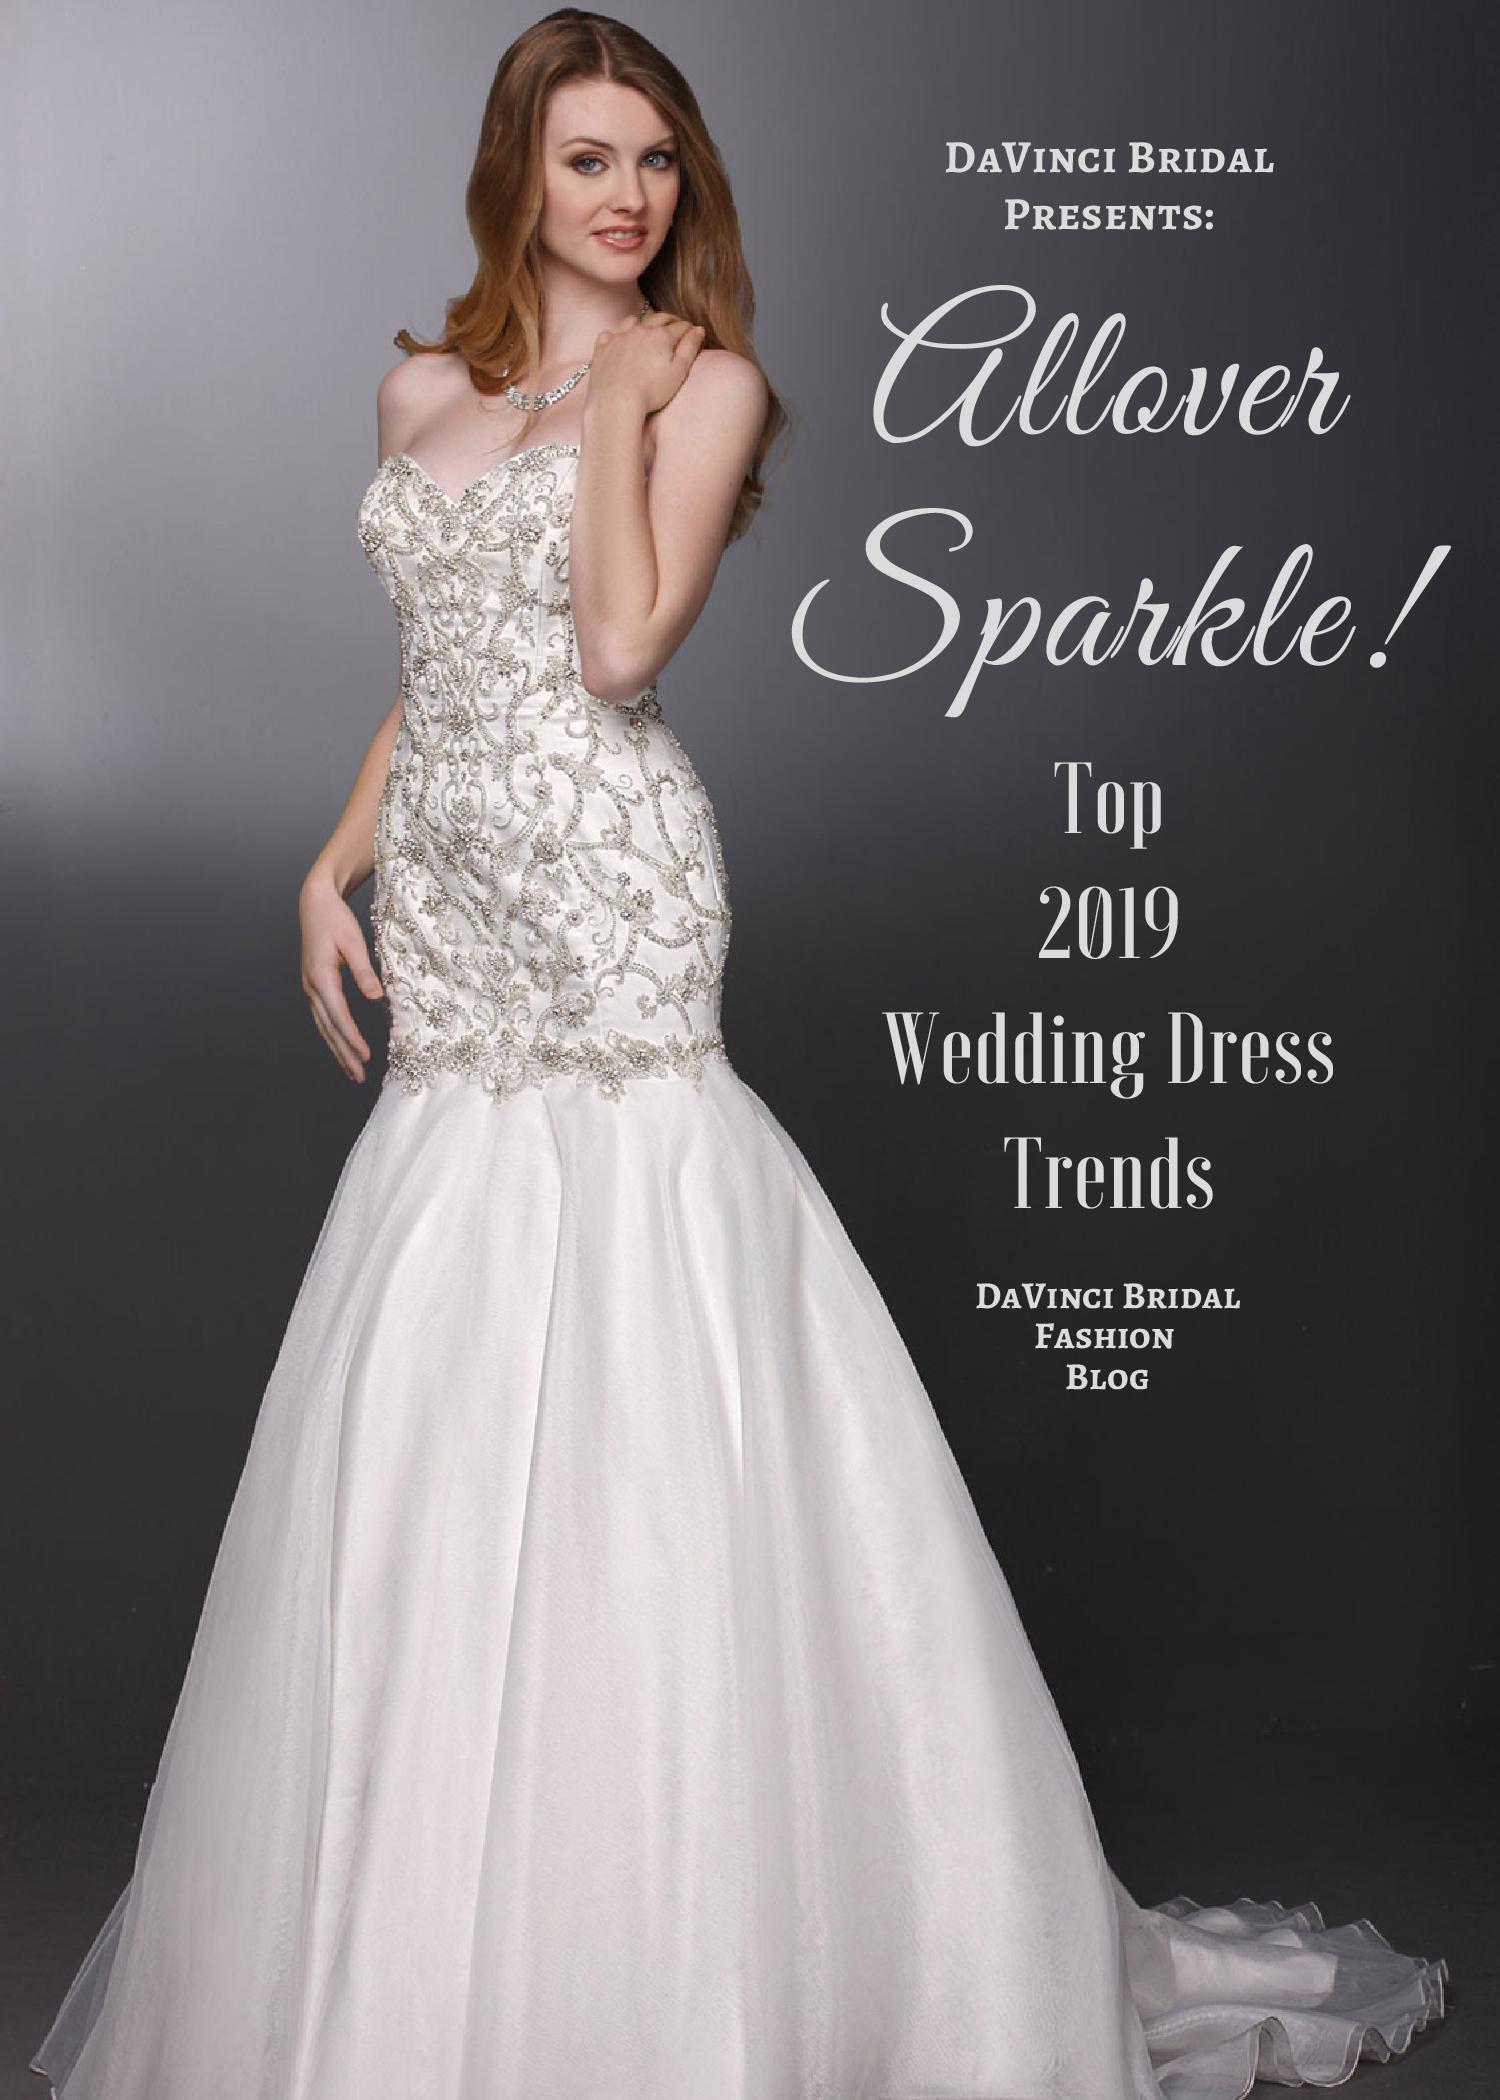 67e969541c0 Top 2019 Wedding Dress Trends Allover Sparkle – DaVinci Bridal Fashion Blog